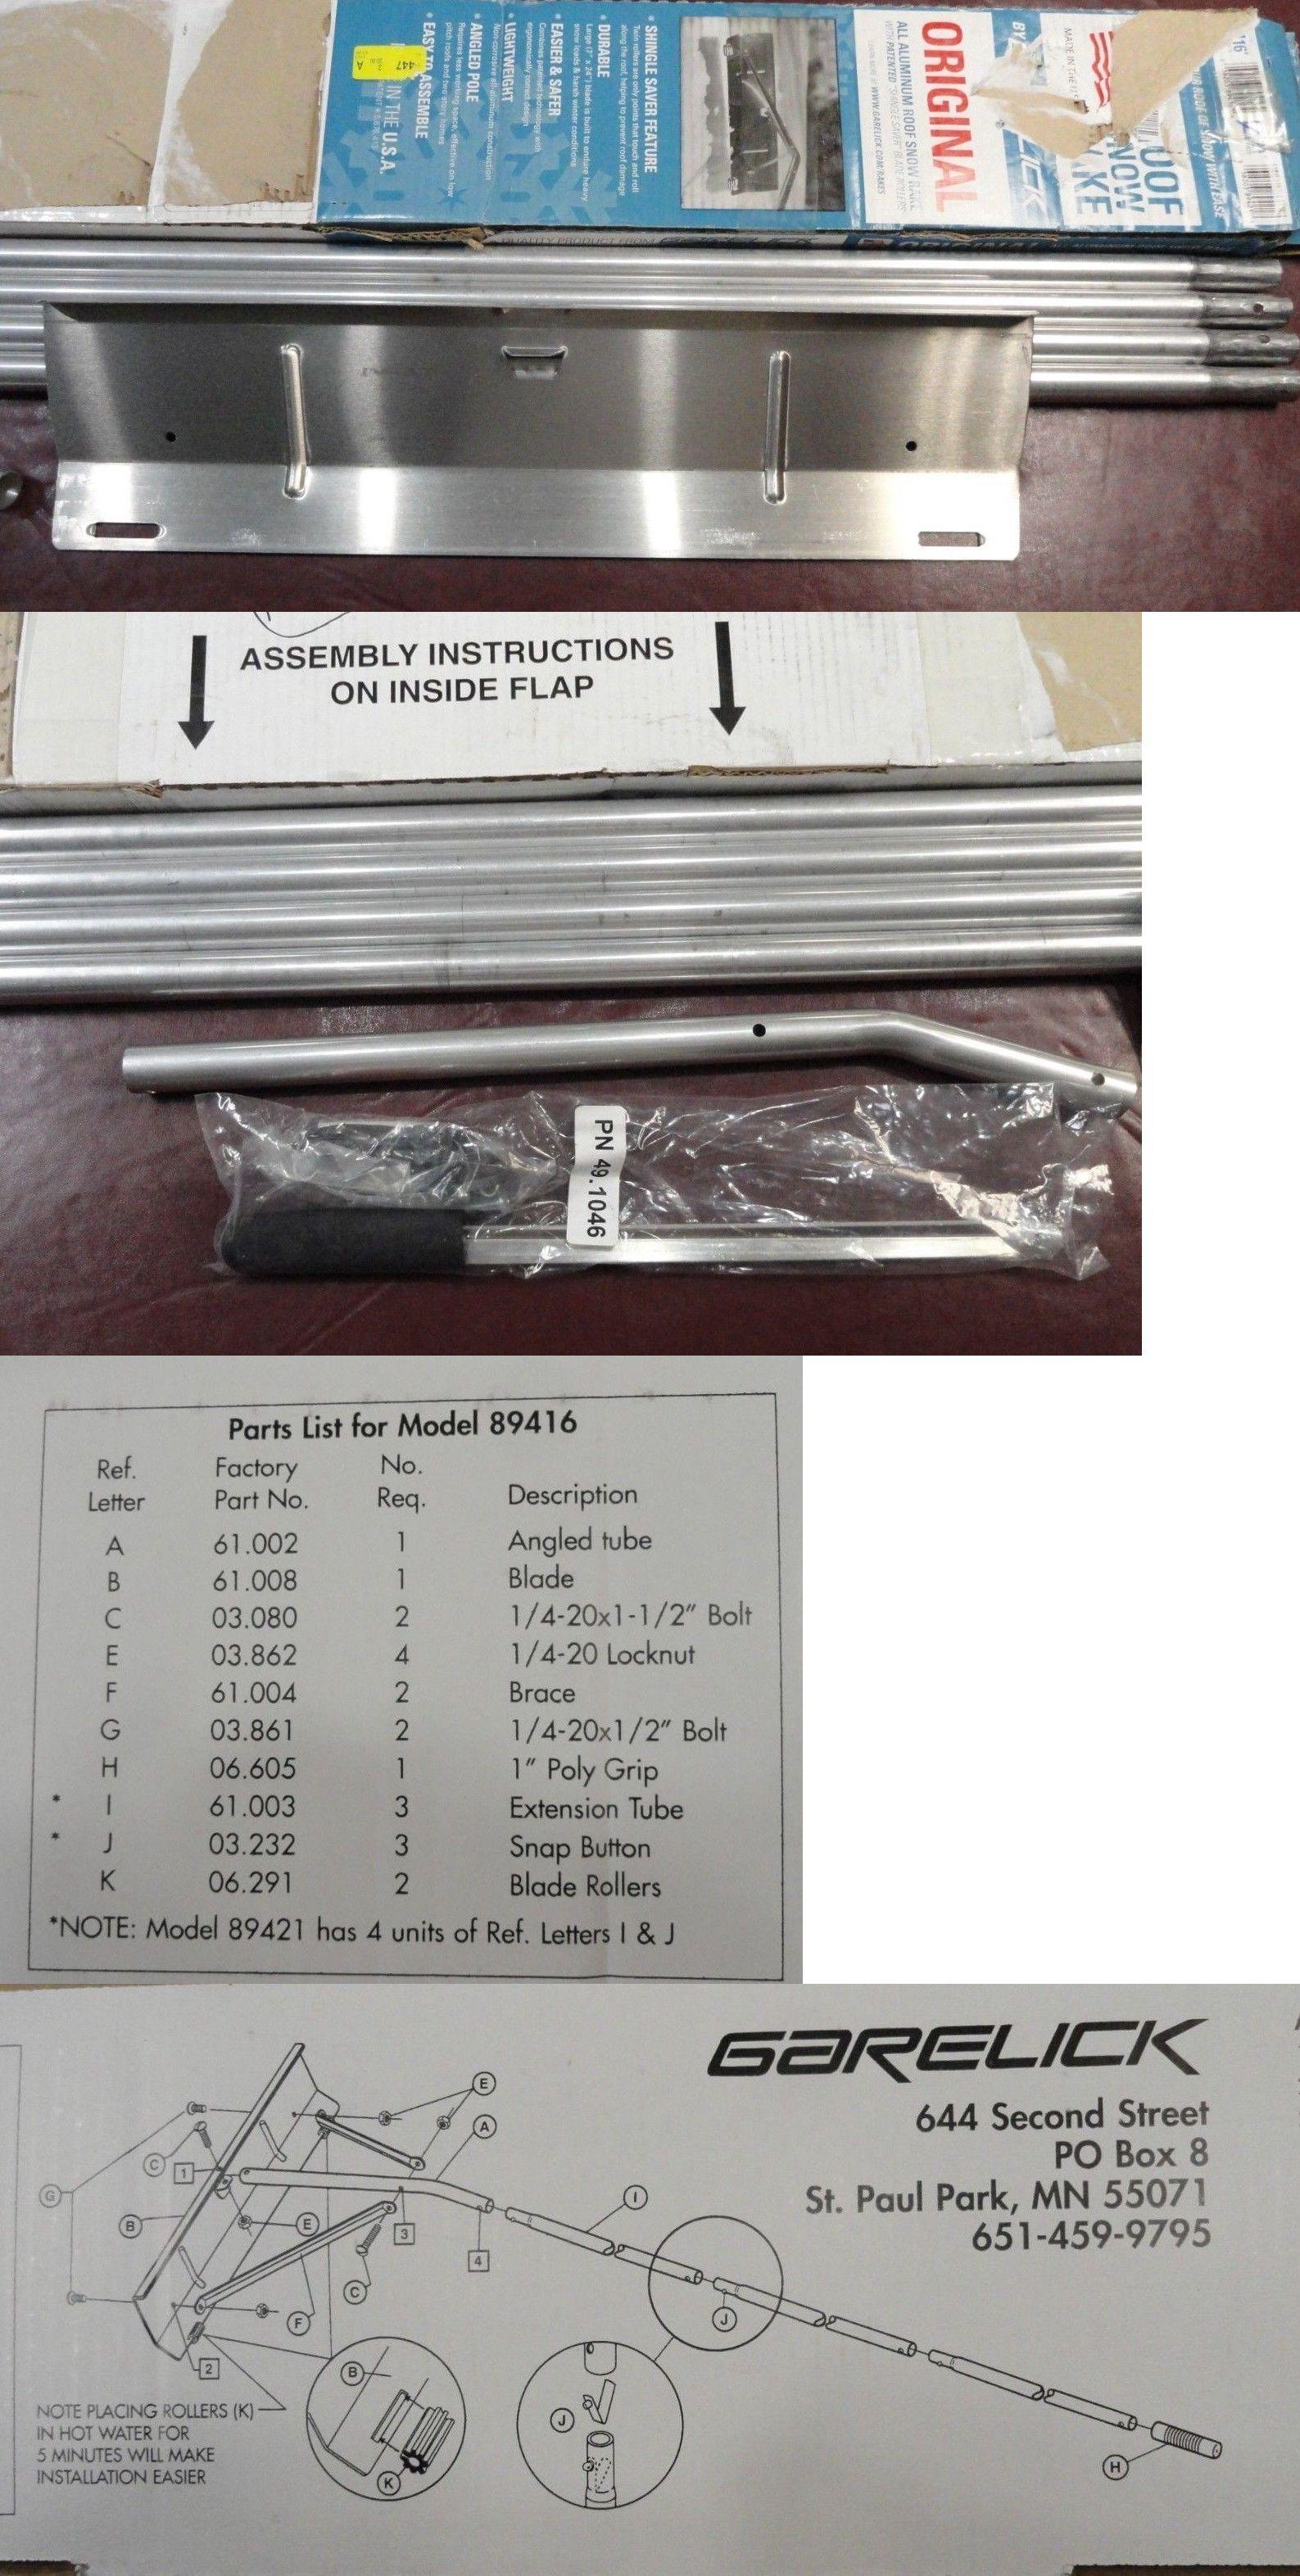 Garelick 21 Foot Aluminum Snow Roof Rake 24 X 7 Inch Blade Never Used Blade Rakes Aluminum